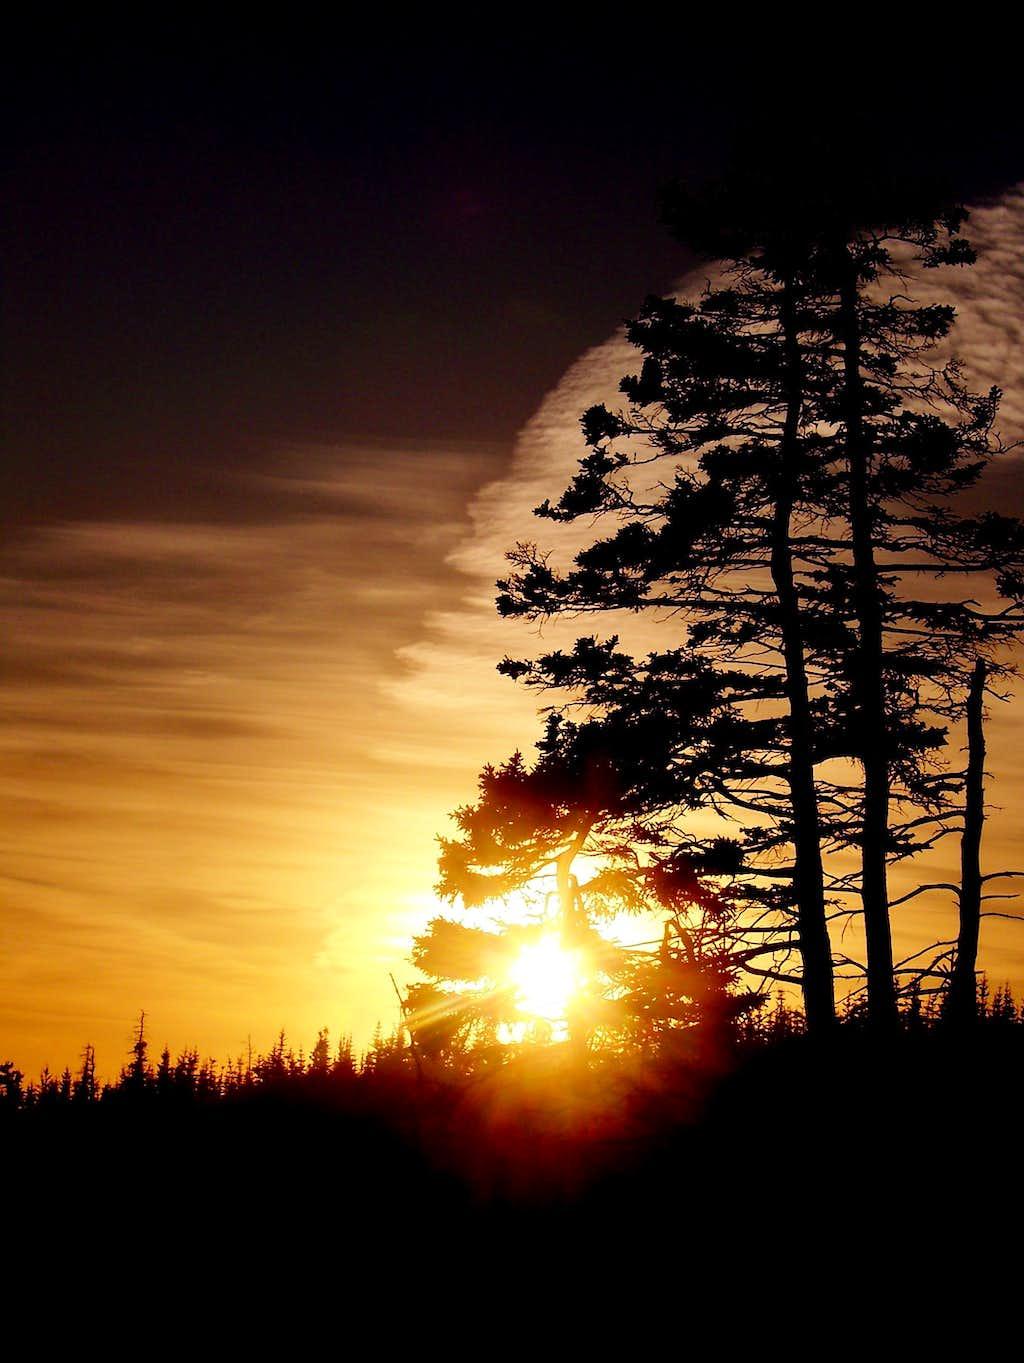 Sunset on quoddy head